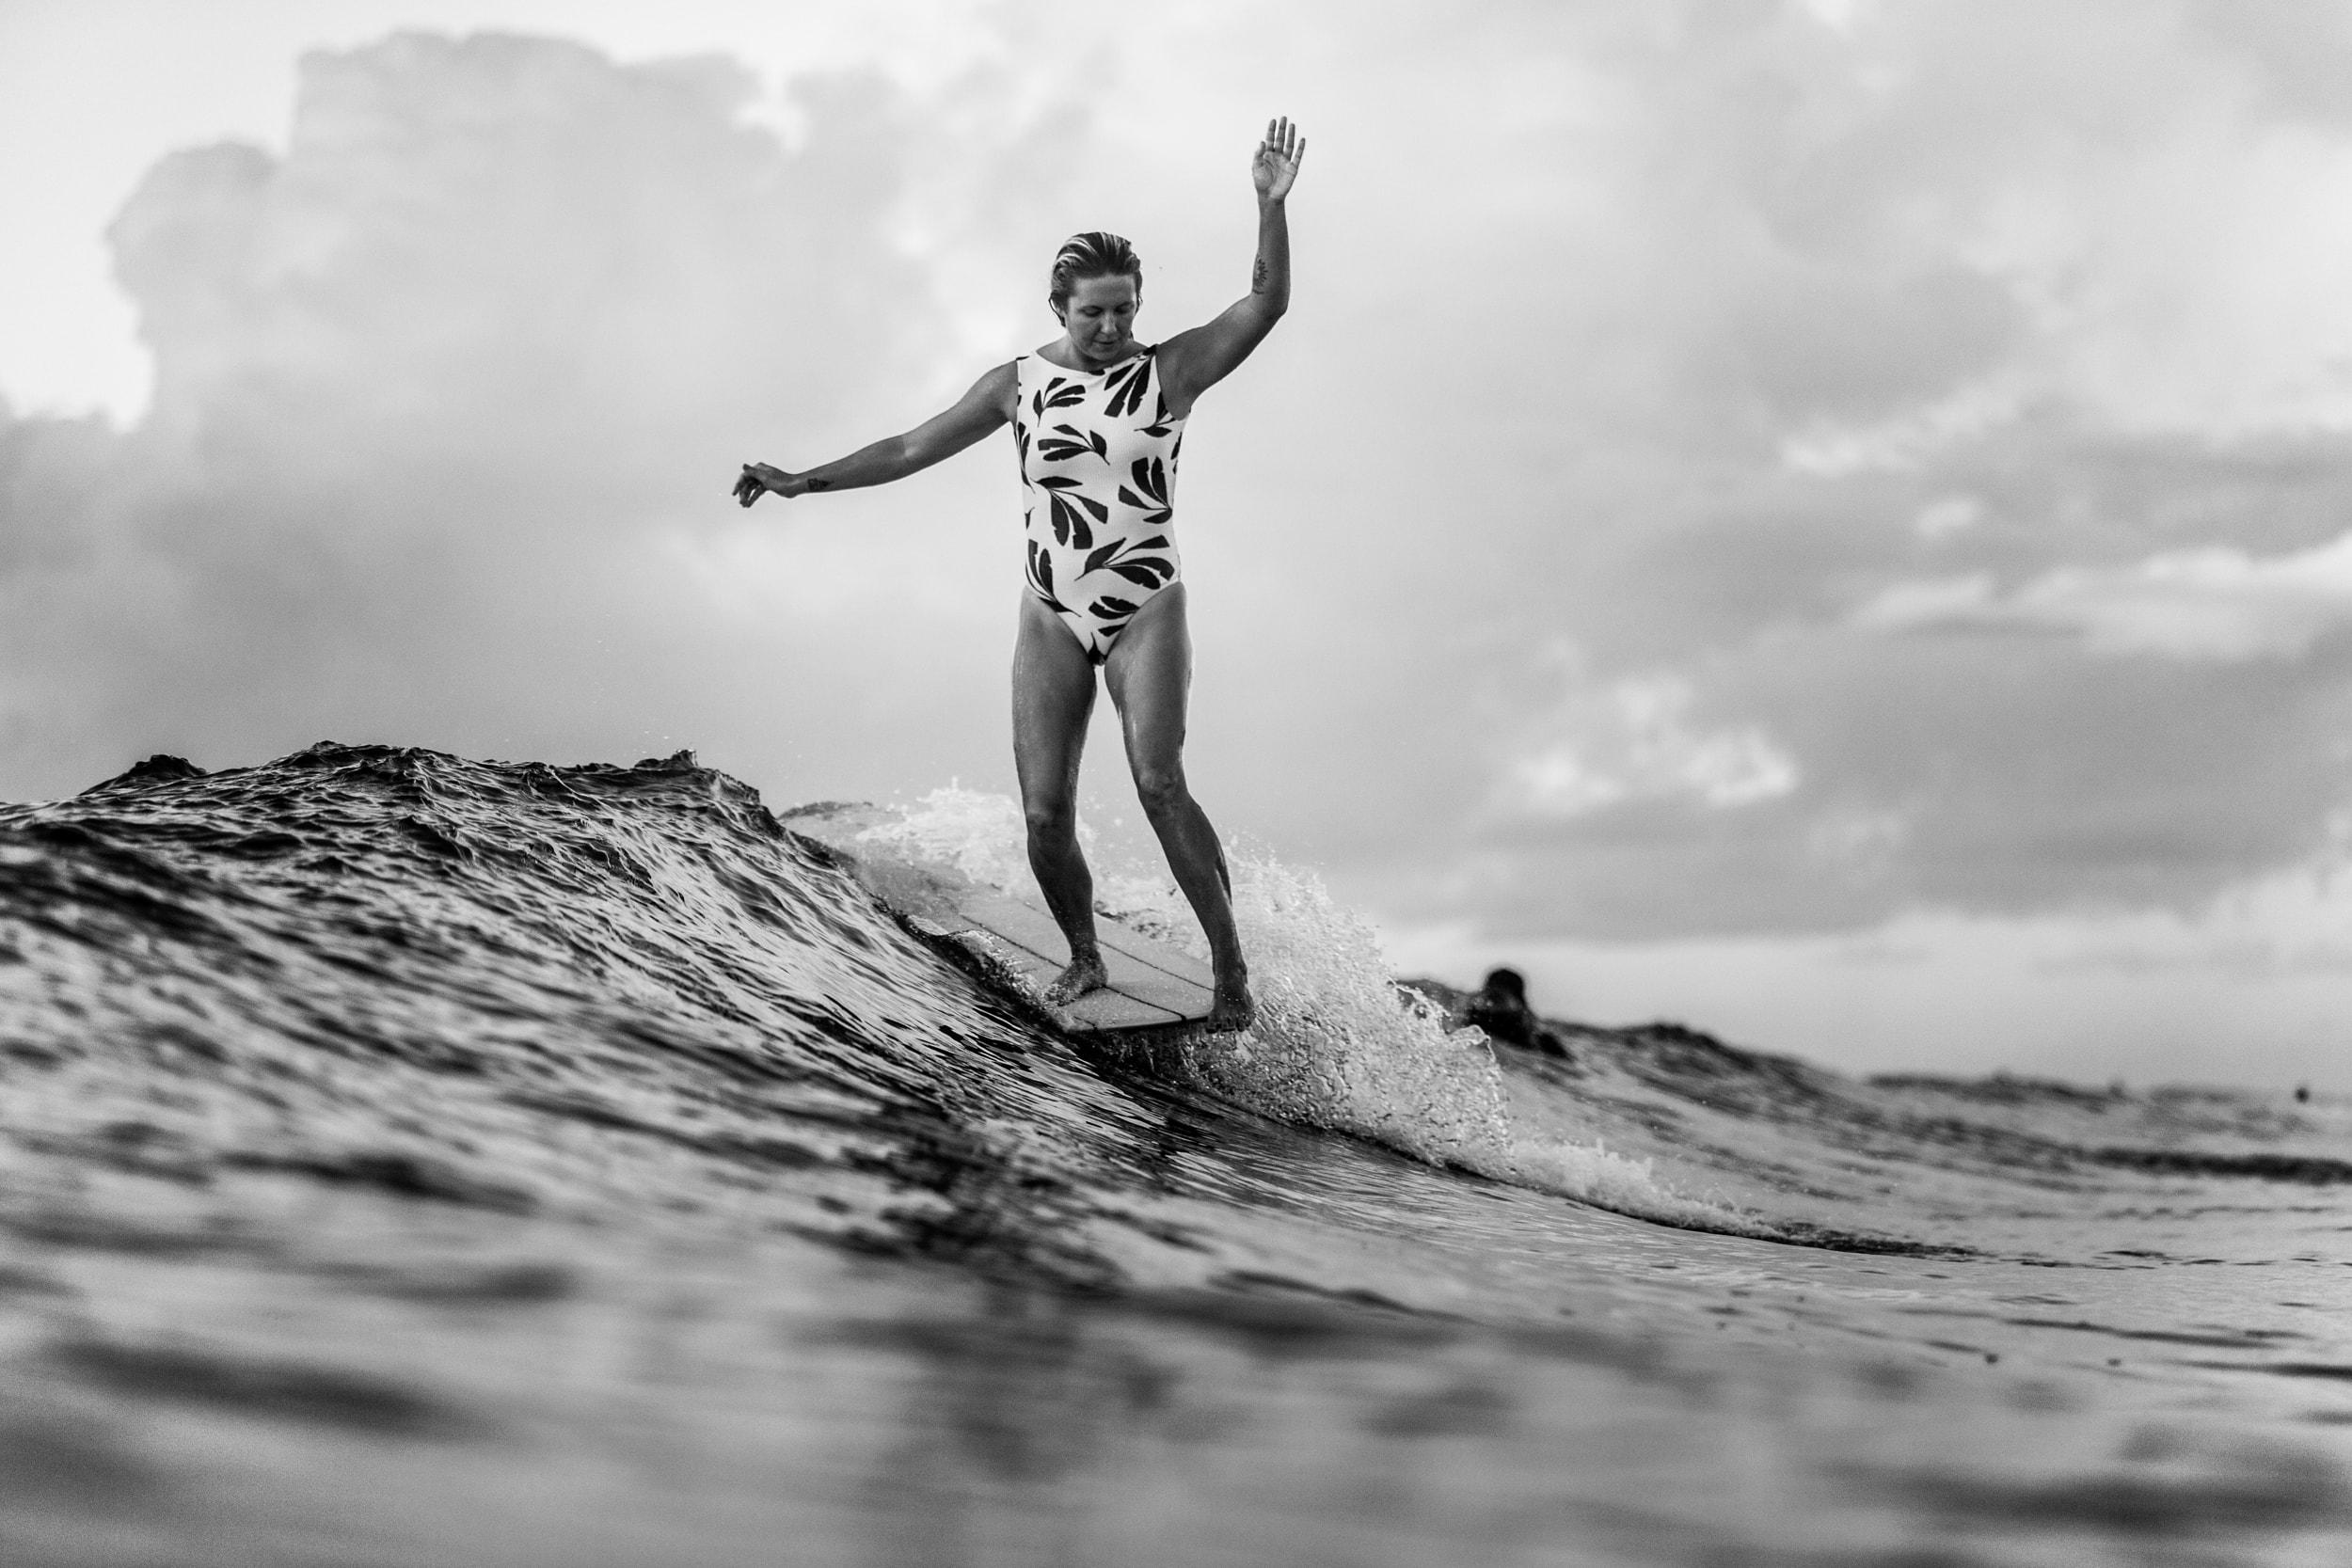 Surfer: Karson Lewis